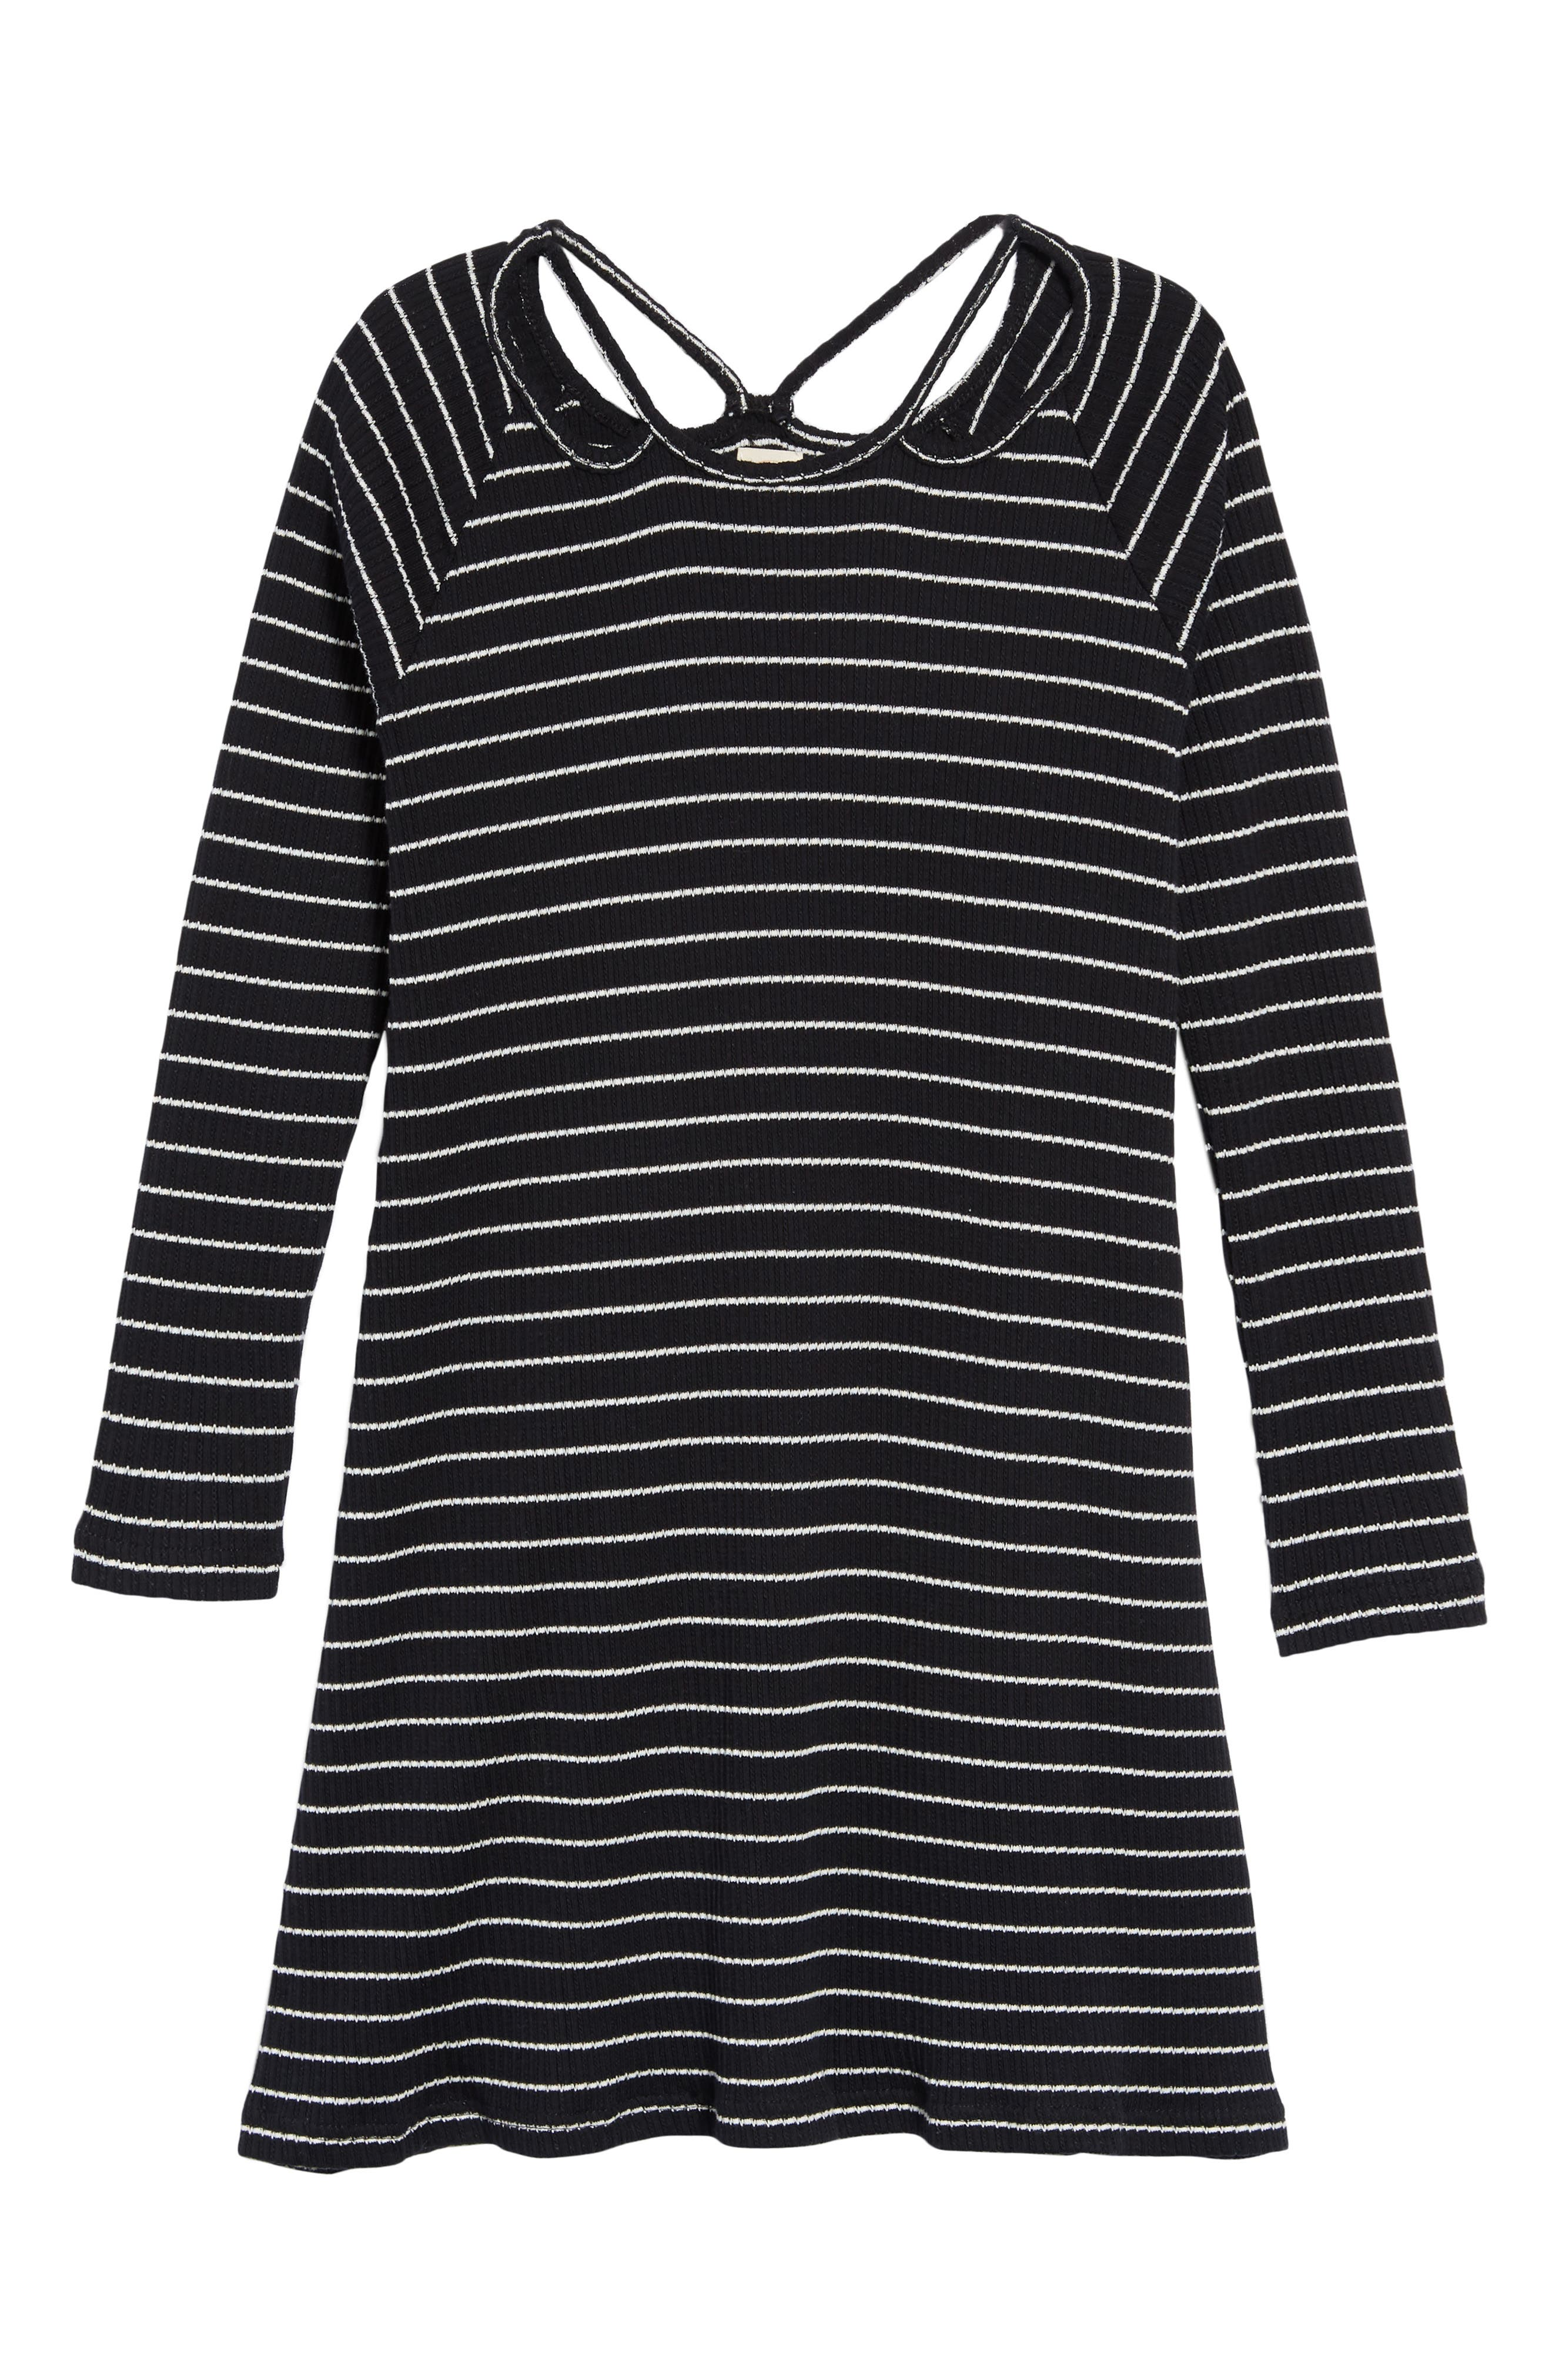 Millie Stripe Knit Dress,                             Main thumbnail 1, color,                             BLACK